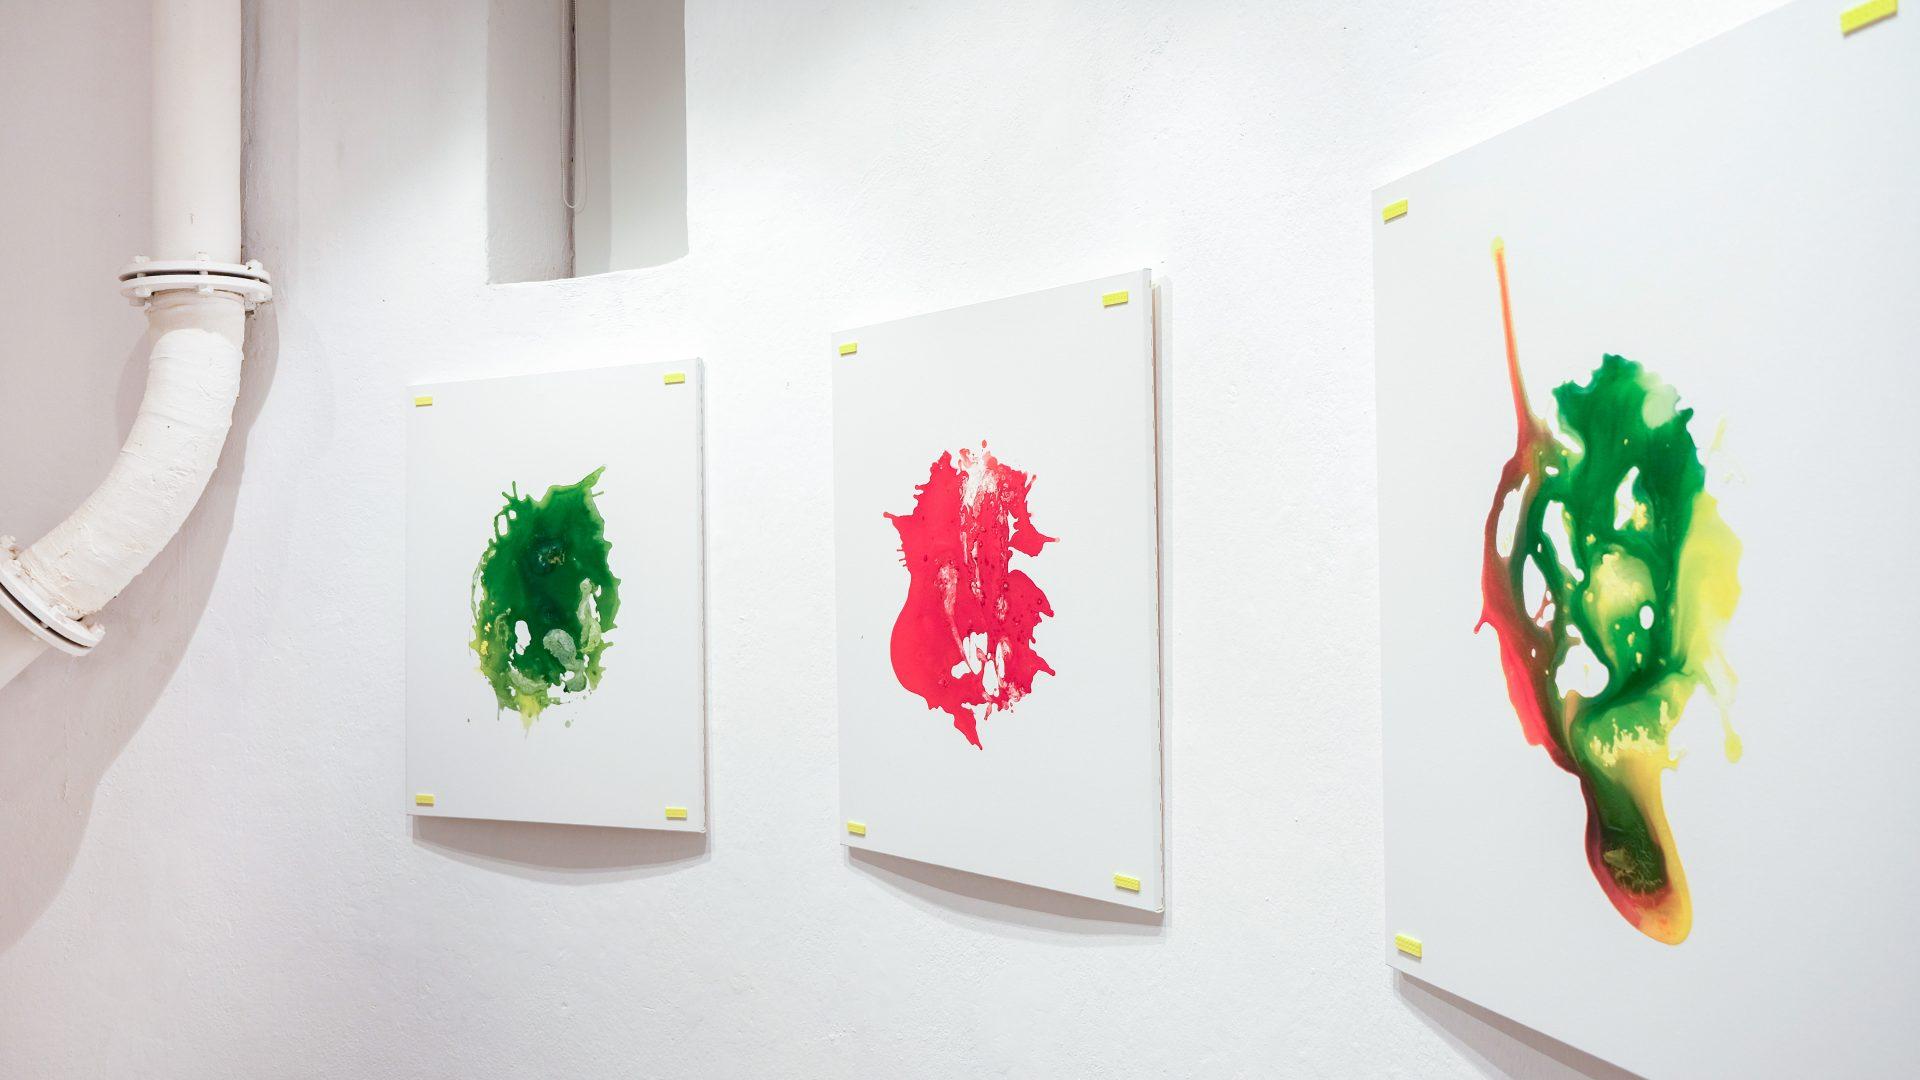 Plus 359 Gallery